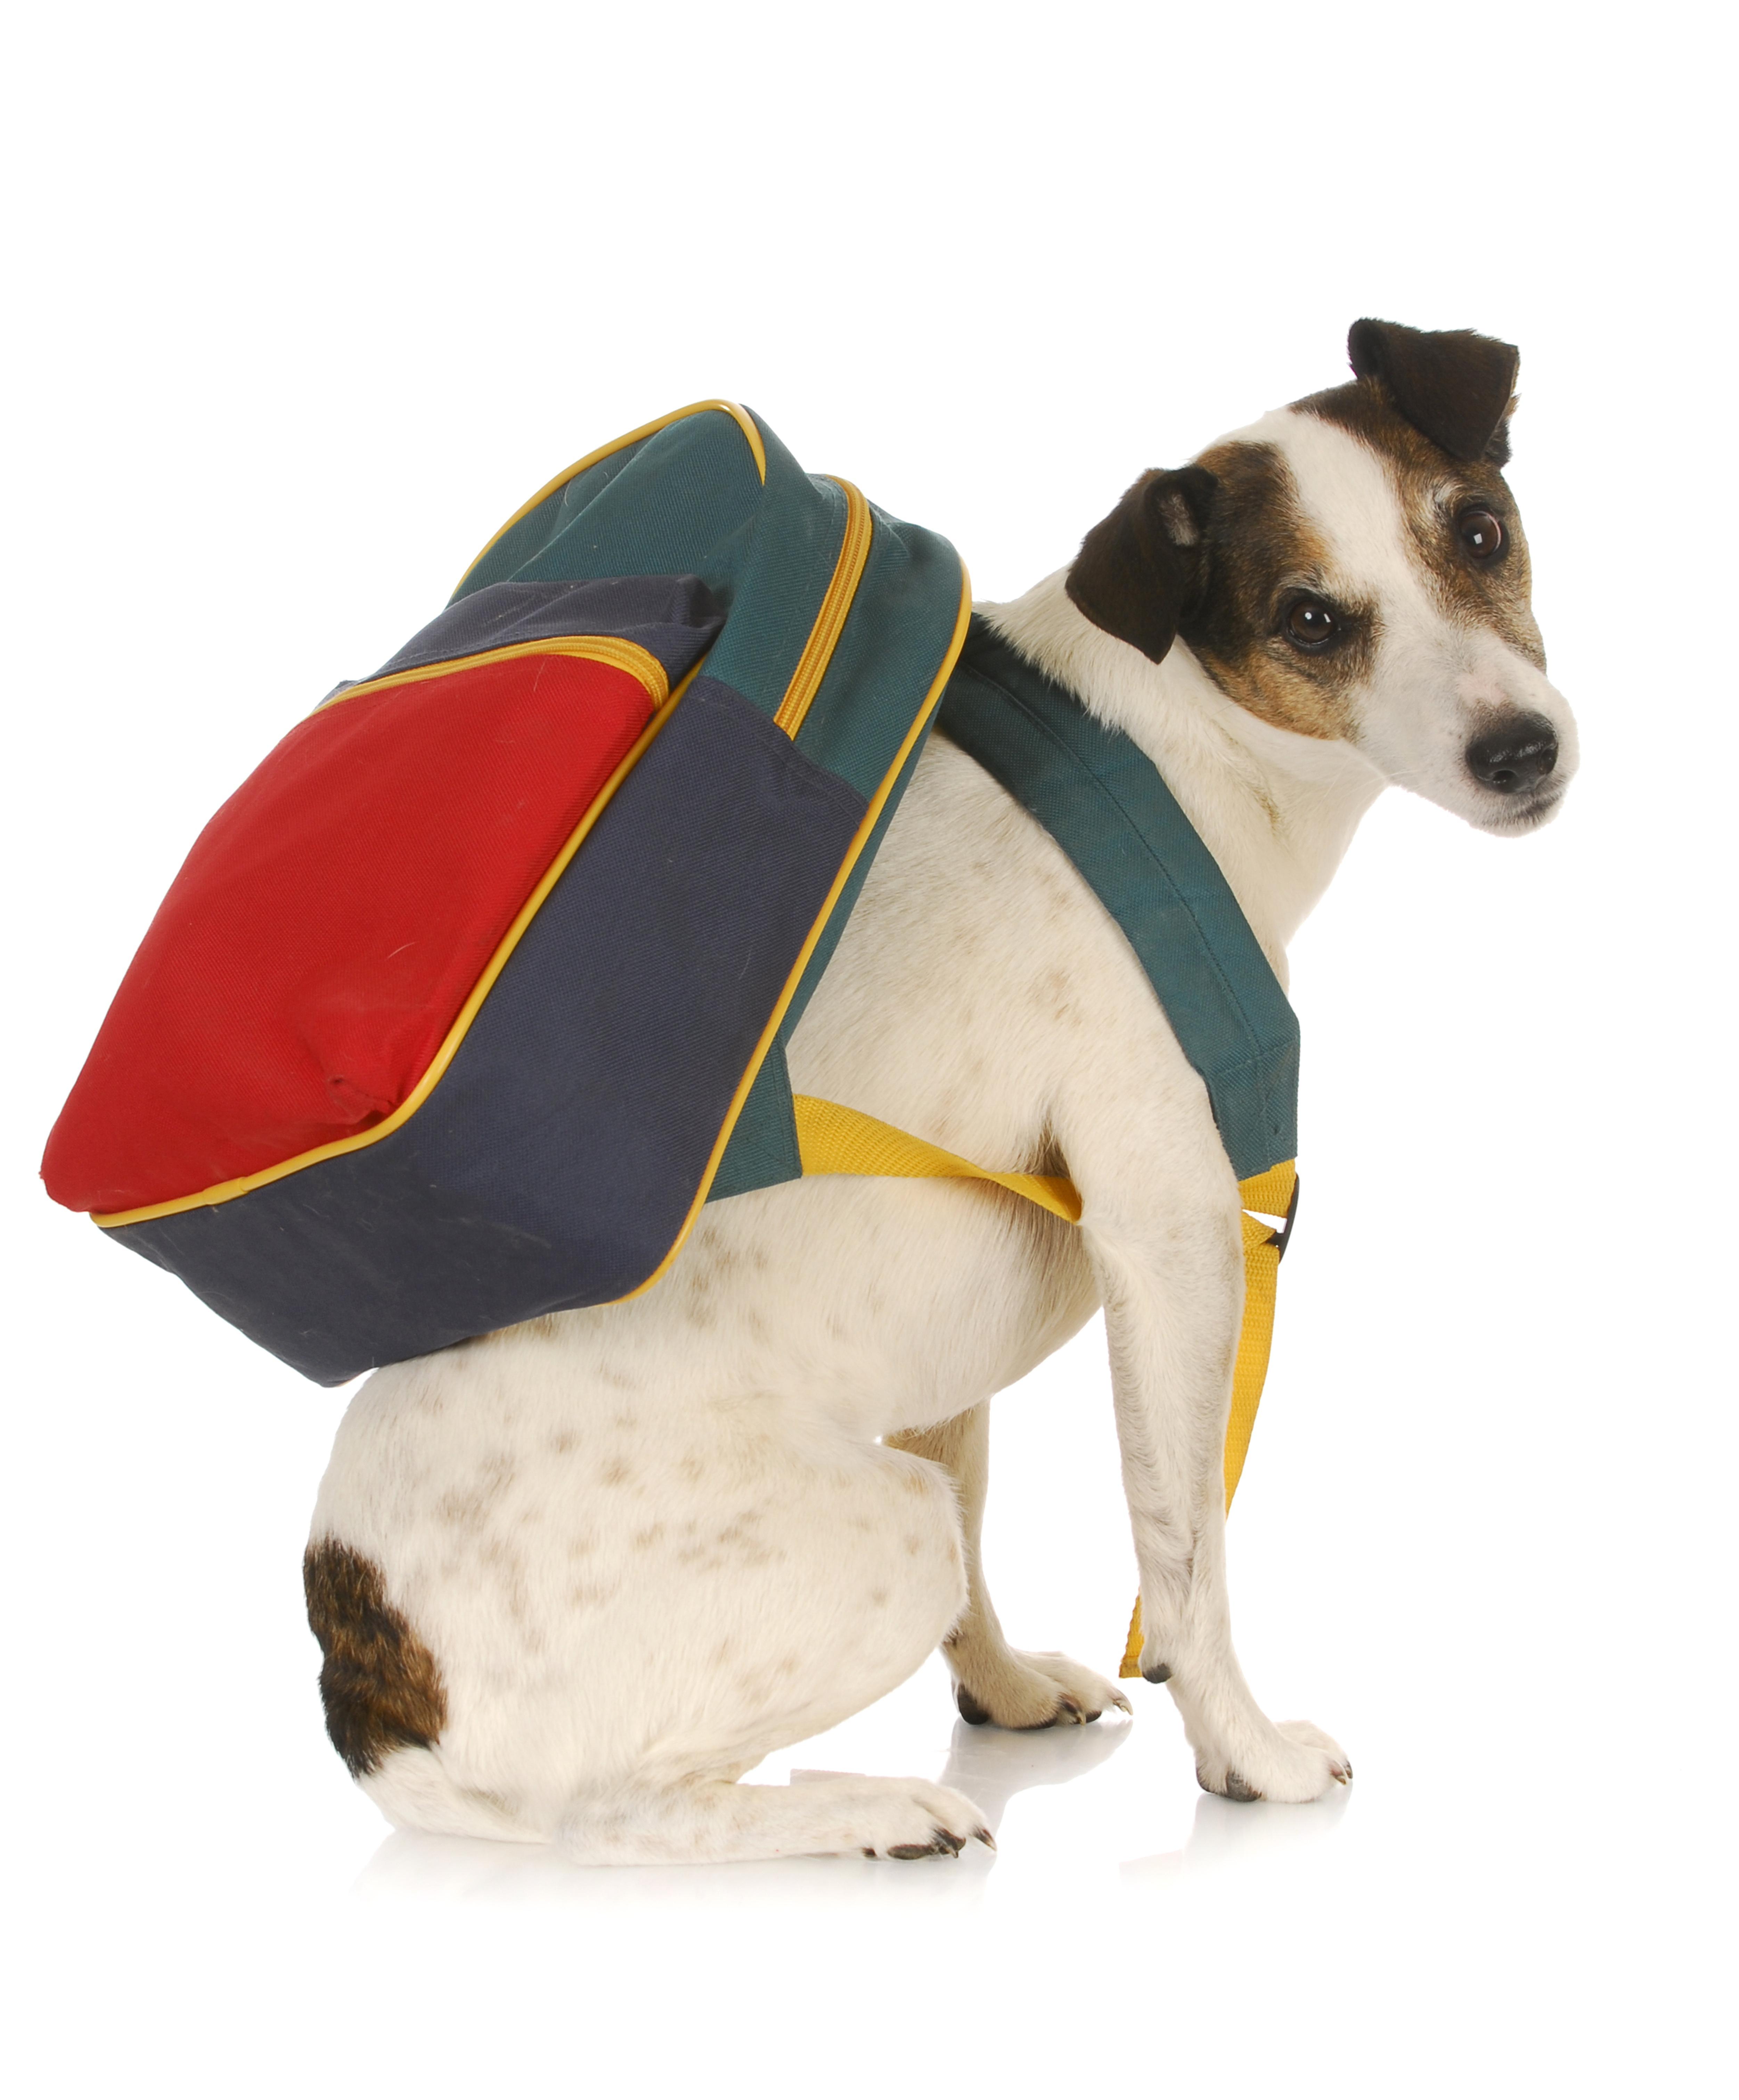 Dog Training Behavior Modification